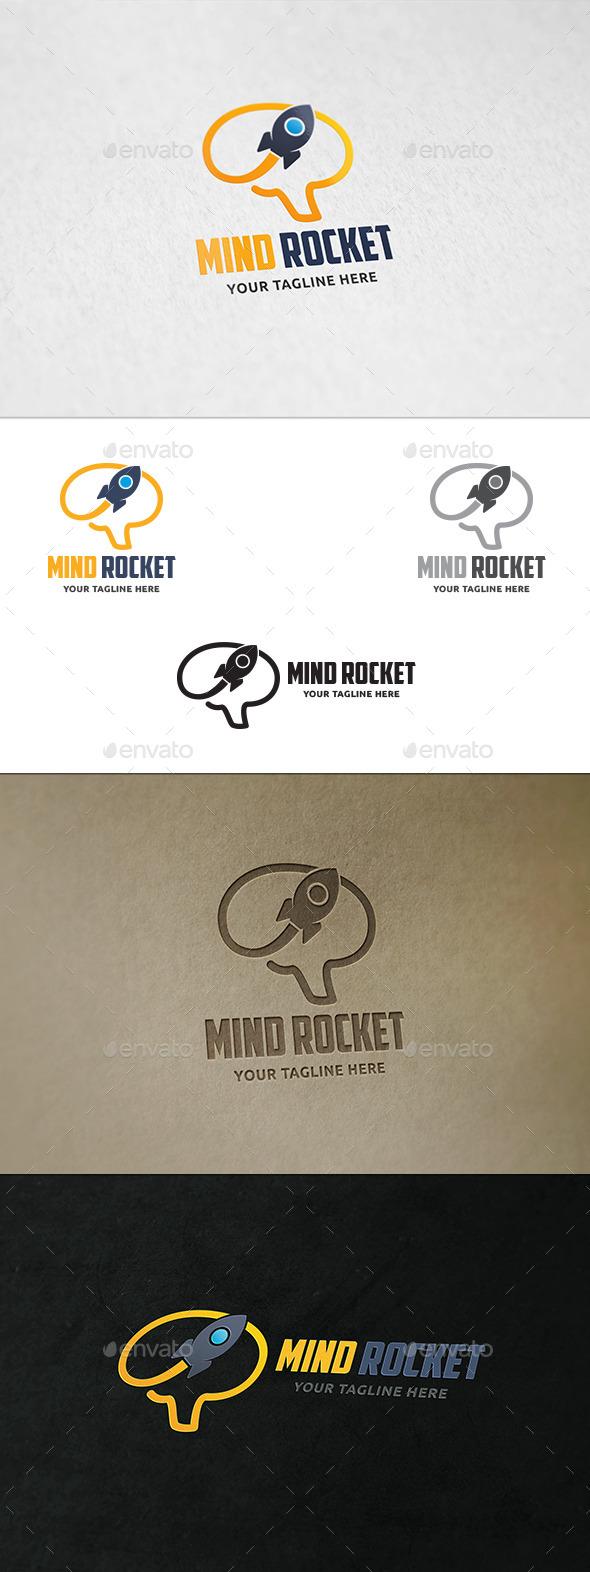 GraphicRiver Mind Rocket Logo Template 11776088